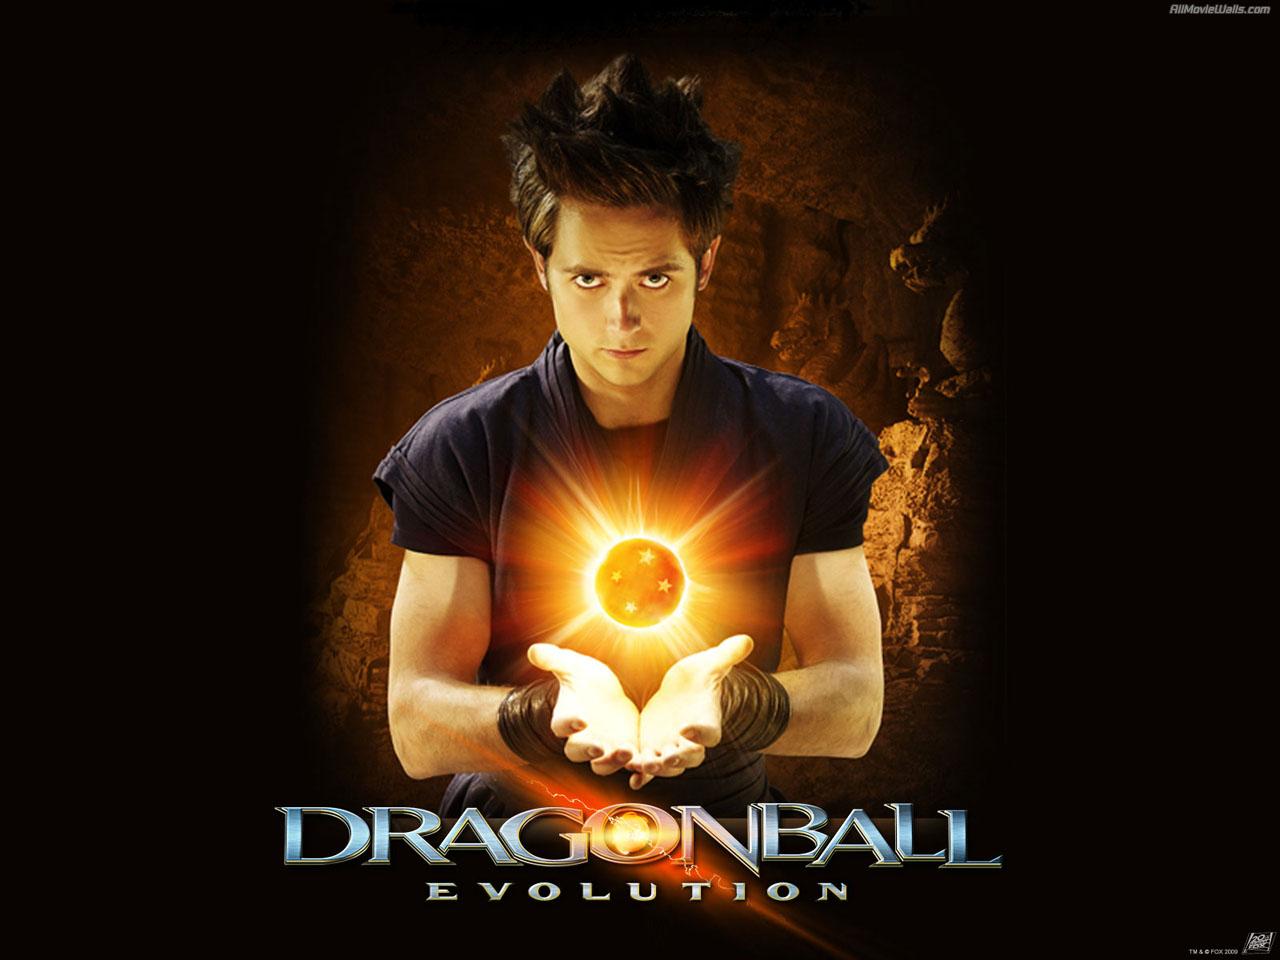 Collector's Movies: Dragon Ball Evolution